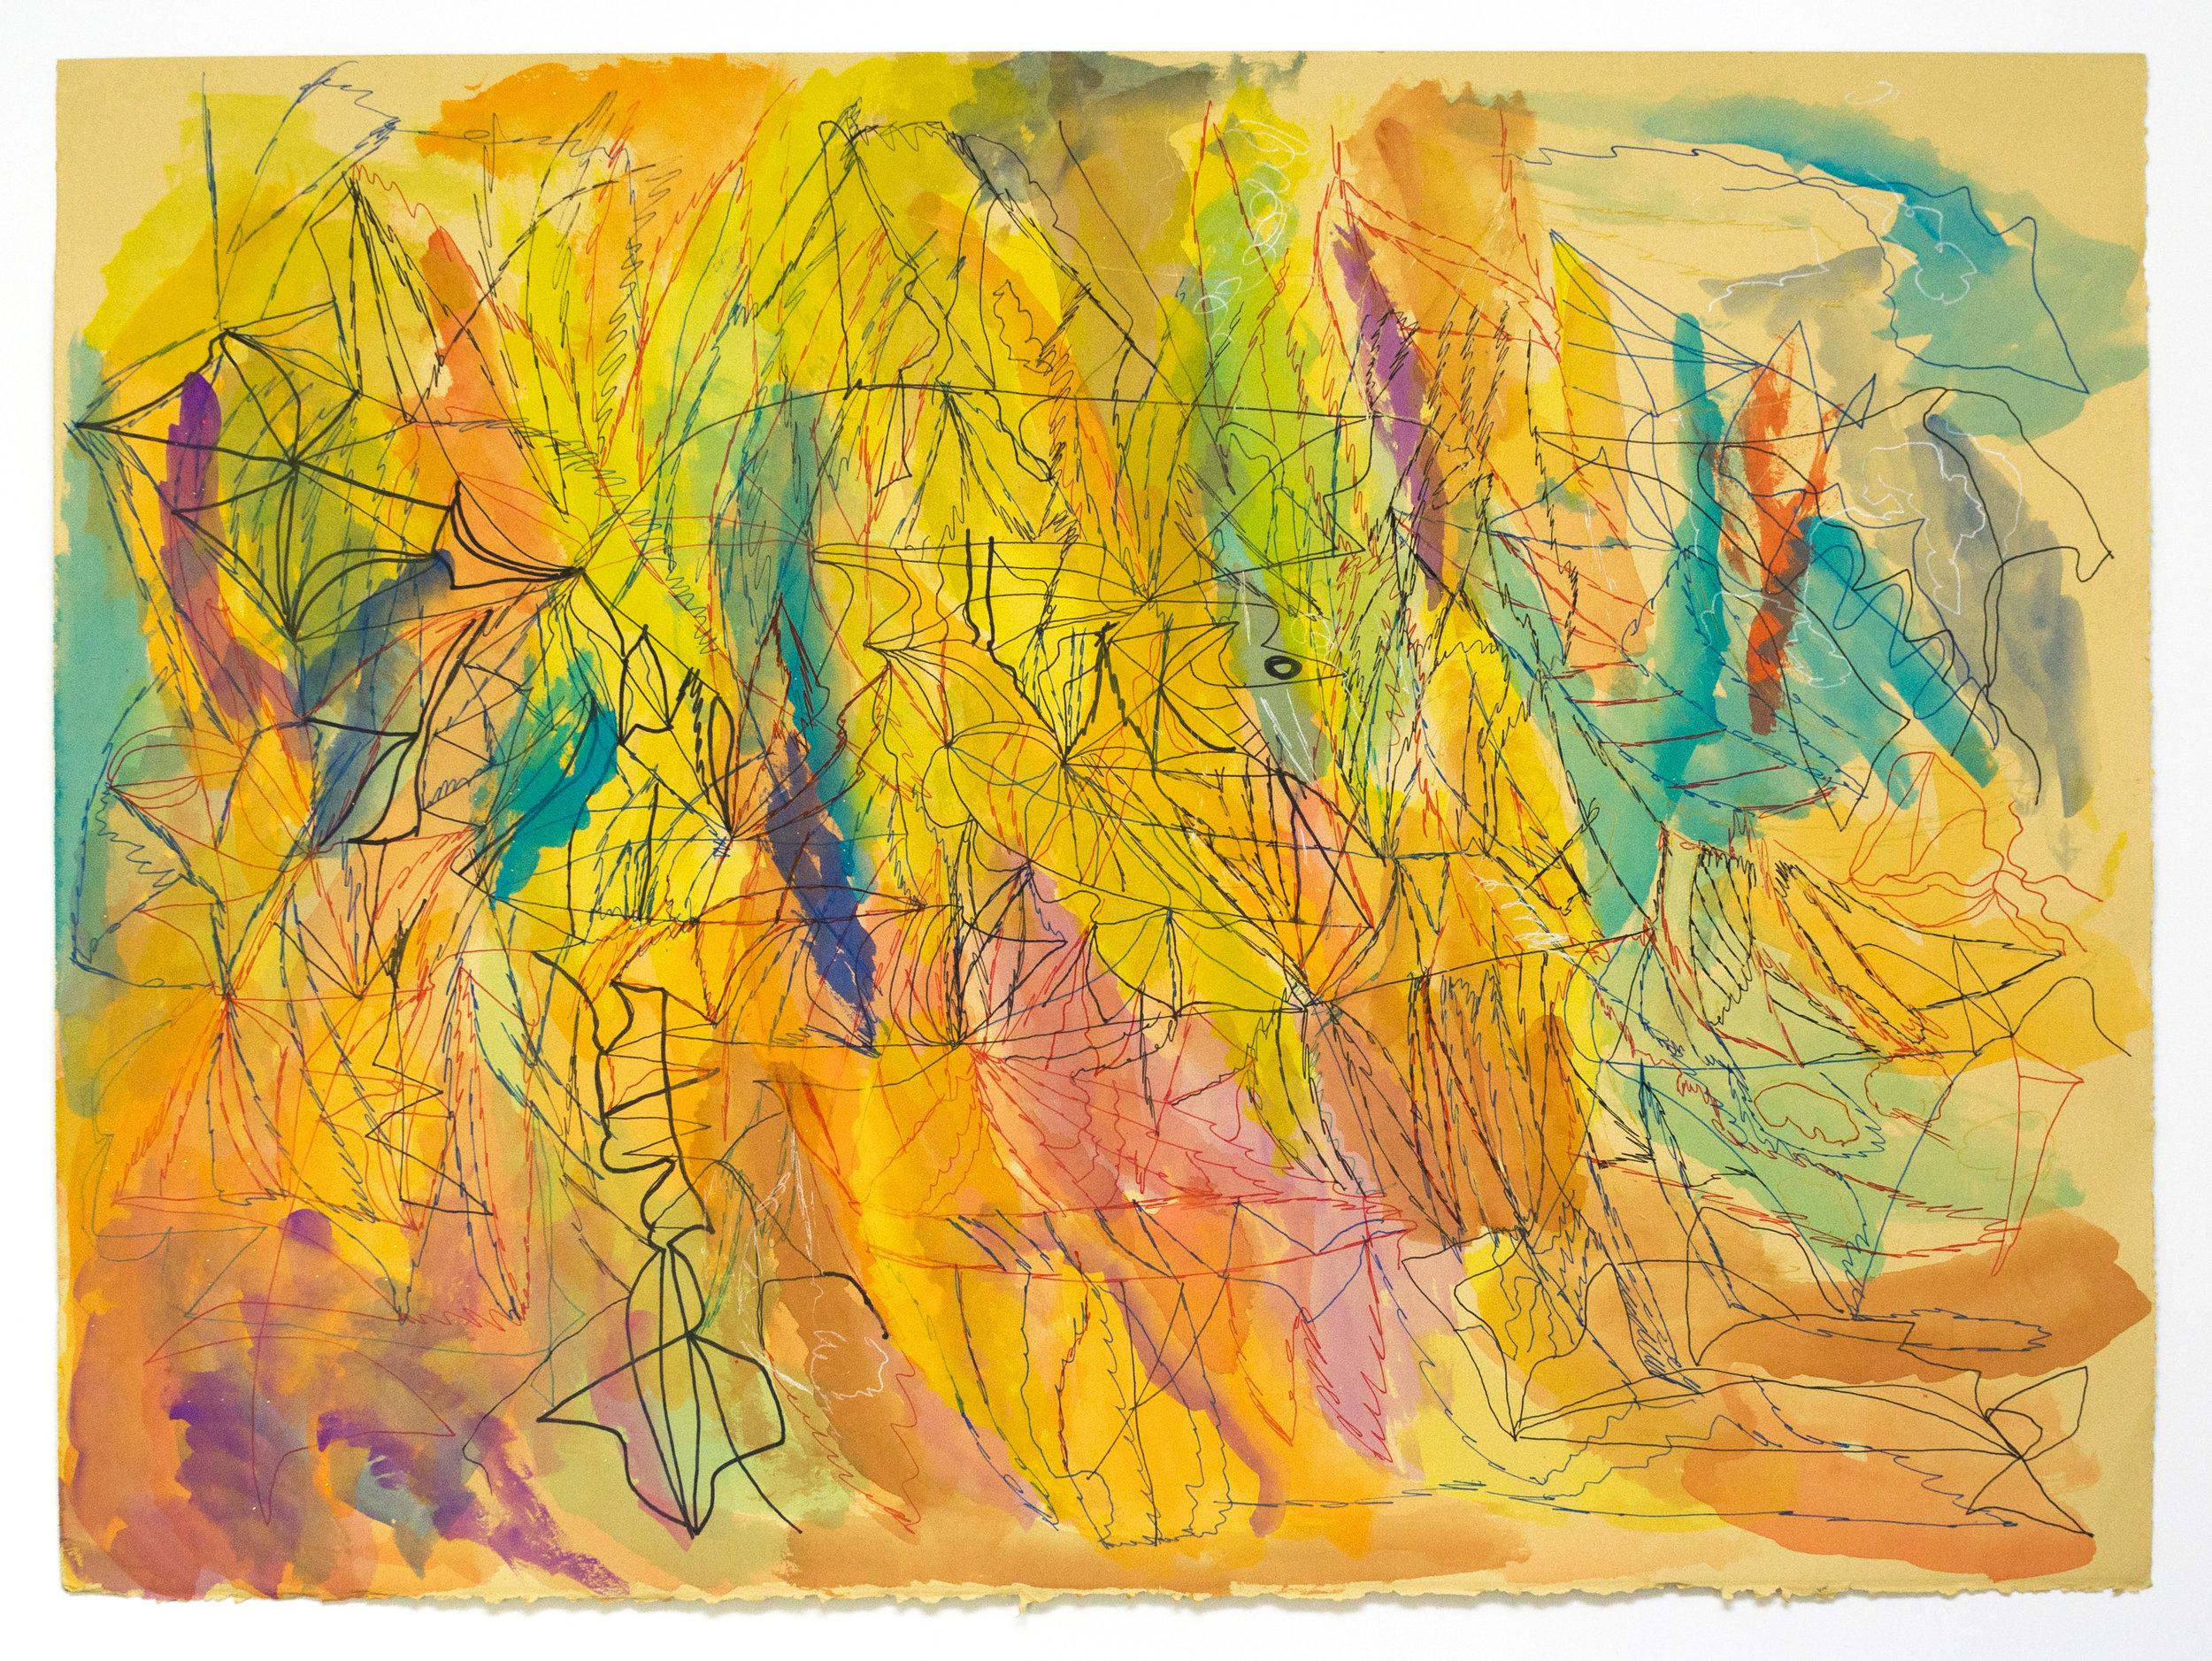 Joseph Alef, Untitled (JA 077), 2018, Work on paper, 22.25 x 30.25 inches